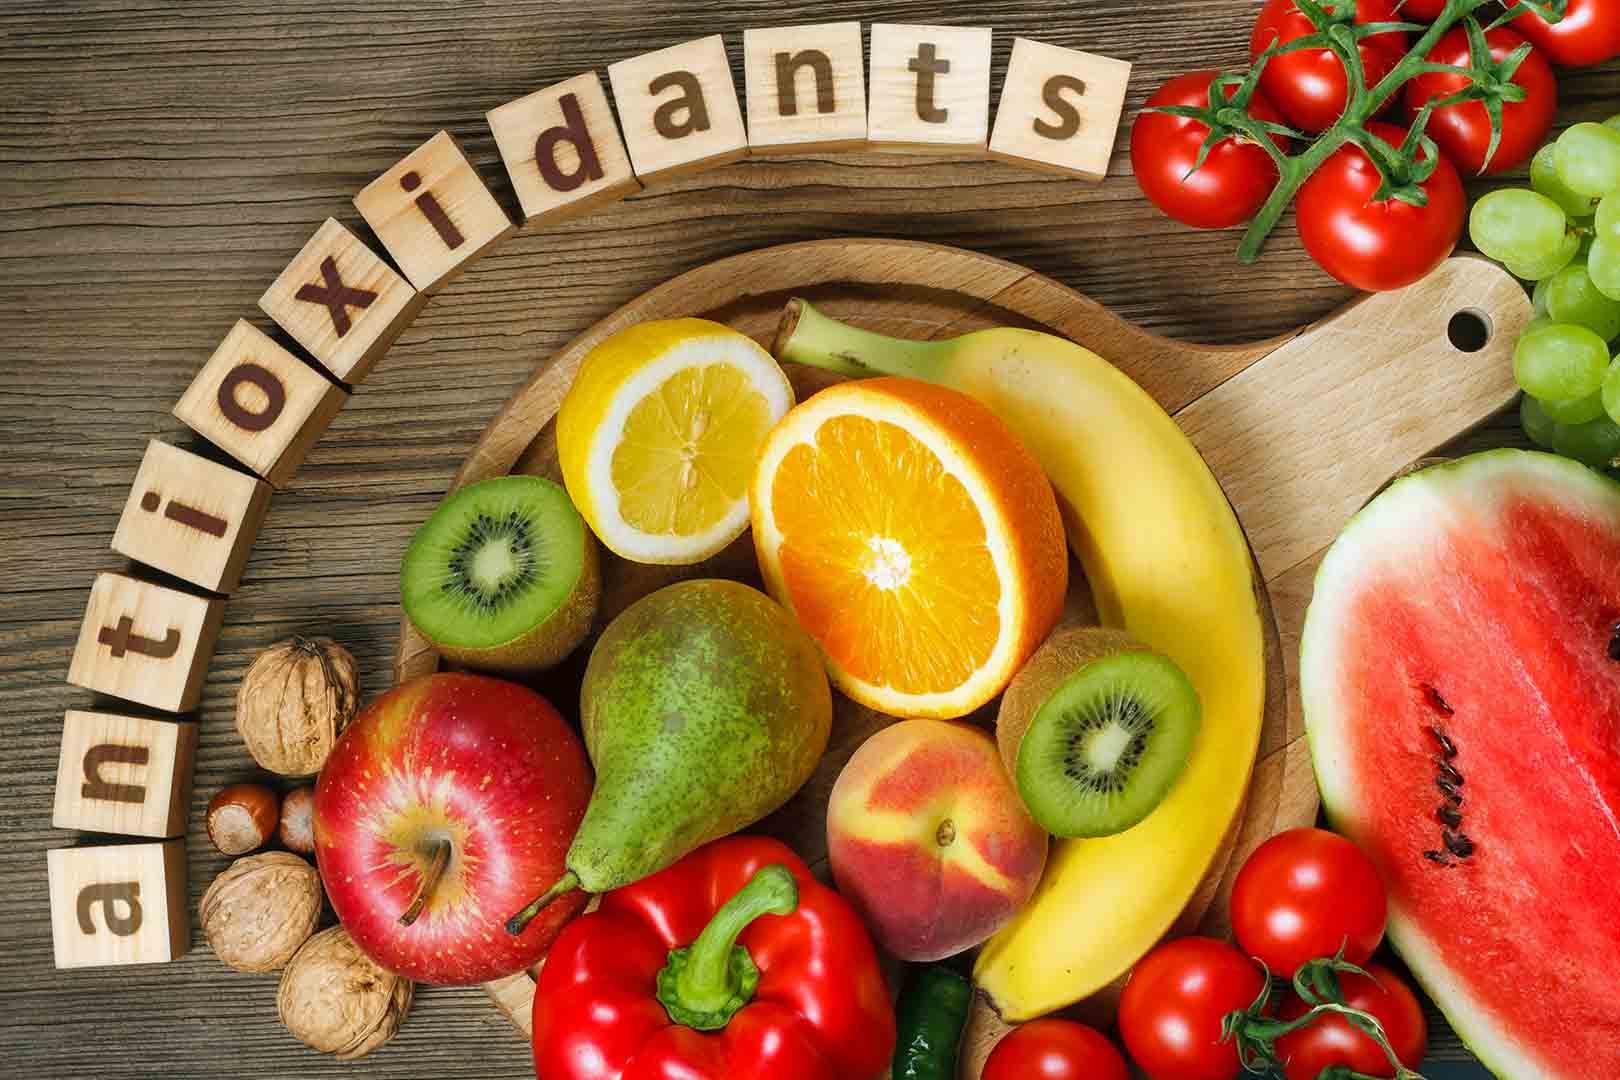 Antioksidan, Senjata Ampuh Memerangi Radikal Bebas Jahat | Lifepack.id